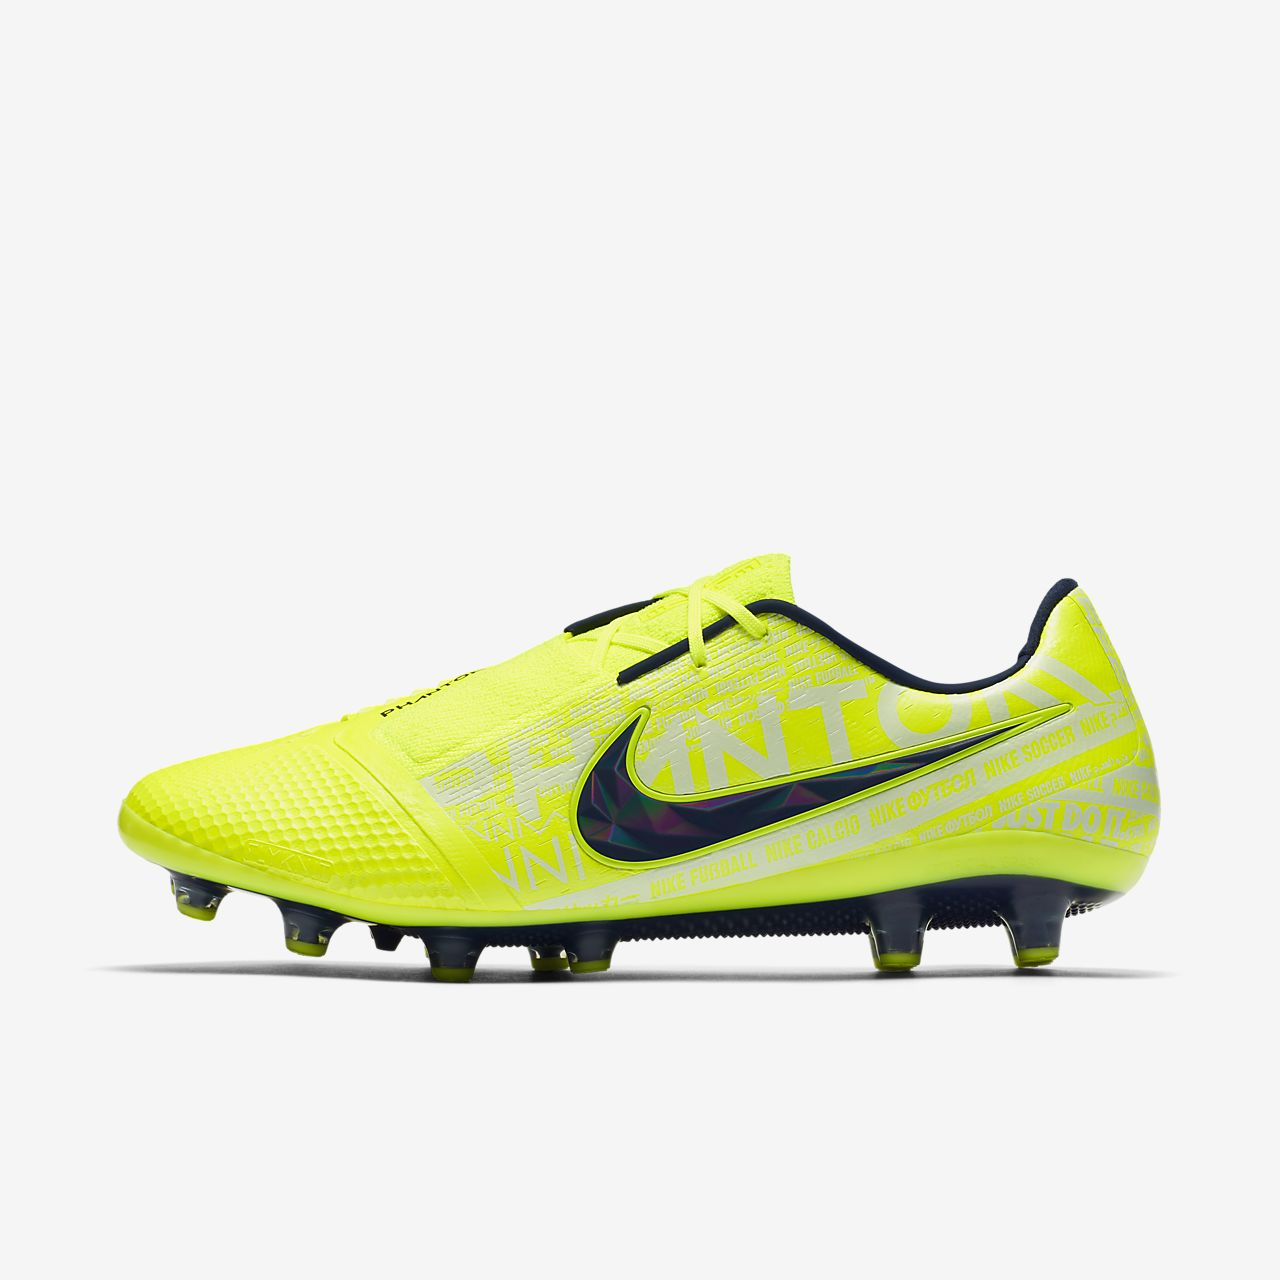 Nike Calcio Ag Elite Artificiale Venom Scarpa Da Pro Phantom Per Erba 3ALq54cRj